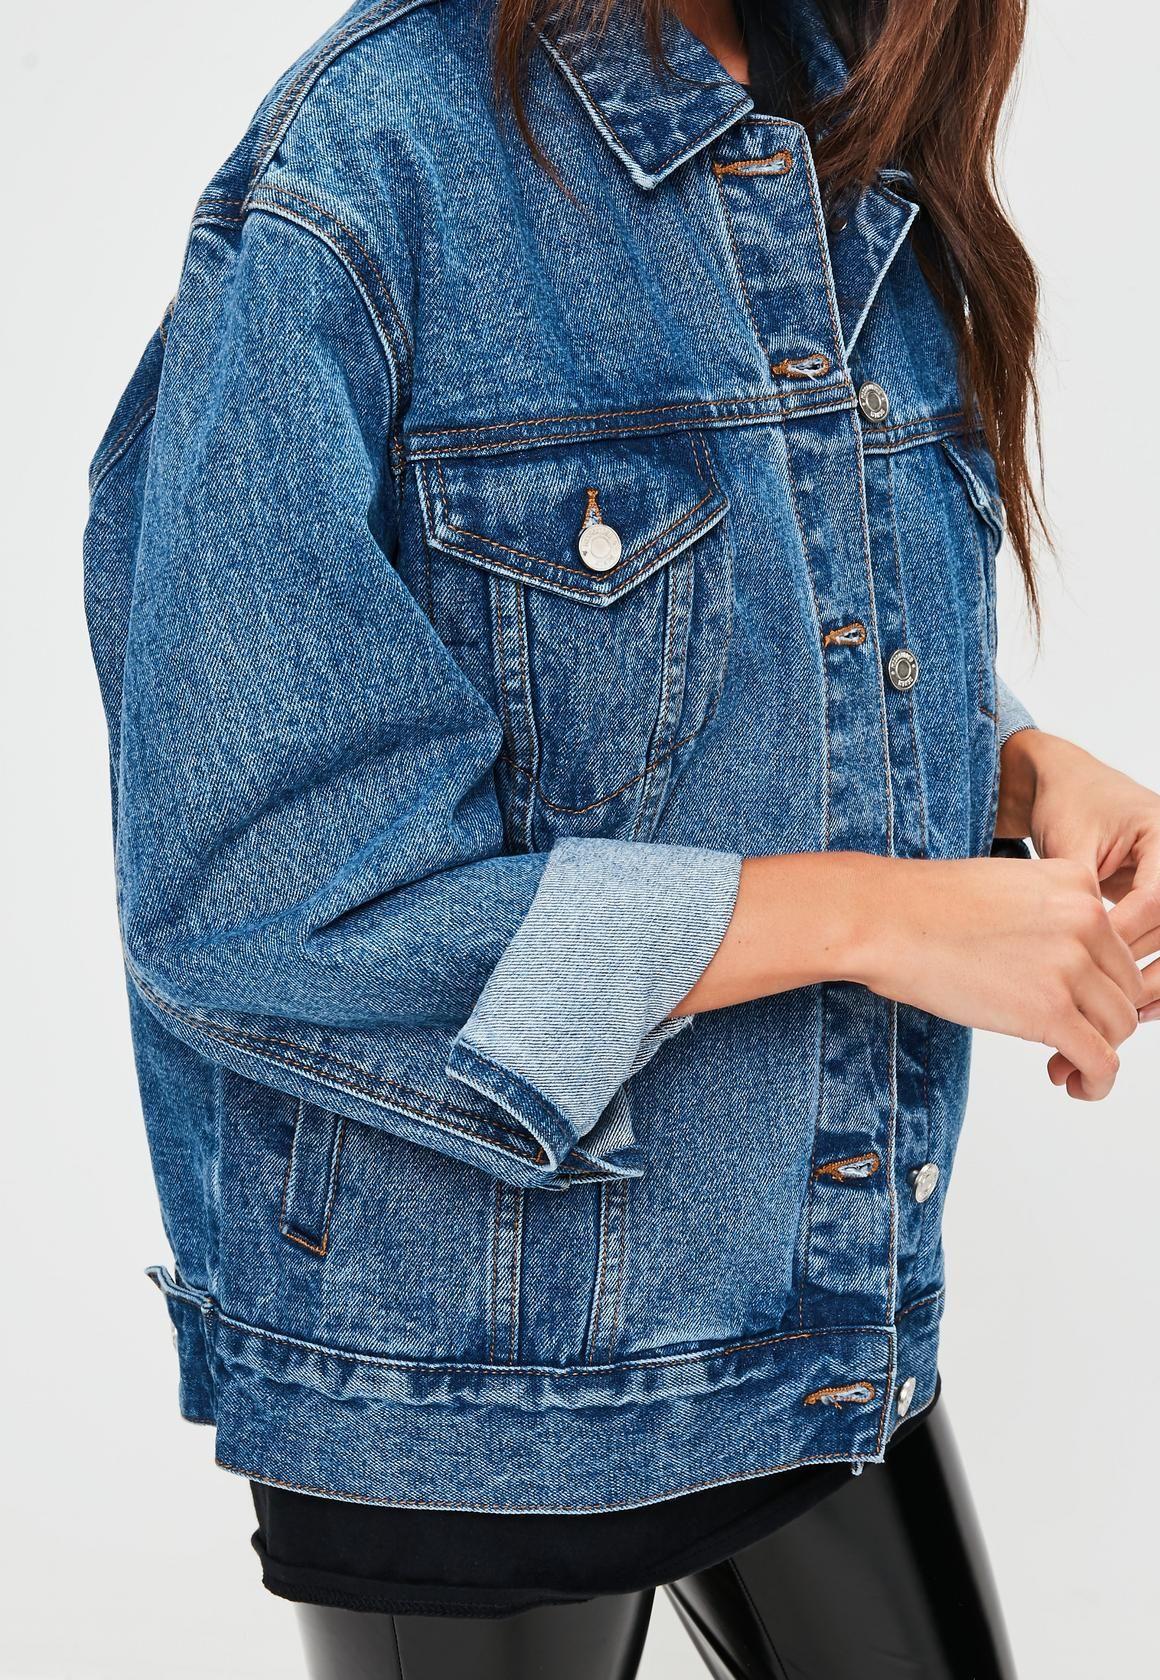 Missguided Blue Oversized Denim Jacket Jean Jacket Outfits Oversized Denim Jacket Oversized Denim Jacket Outfit [ 1680 x 1160 Pixel ]